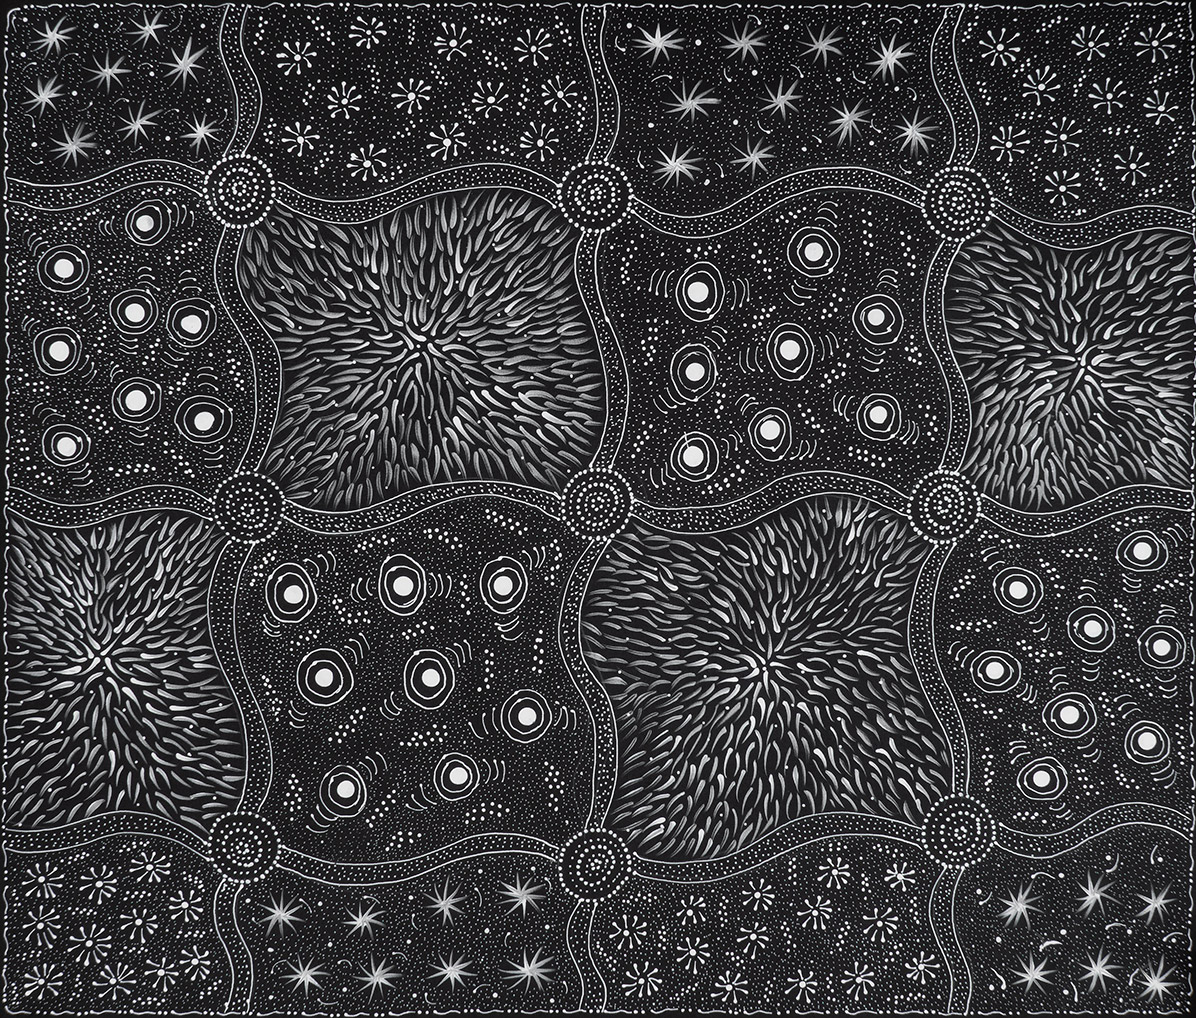 Product shot of Wild Black Seeds Dreaming - © Tanya Price Nangala